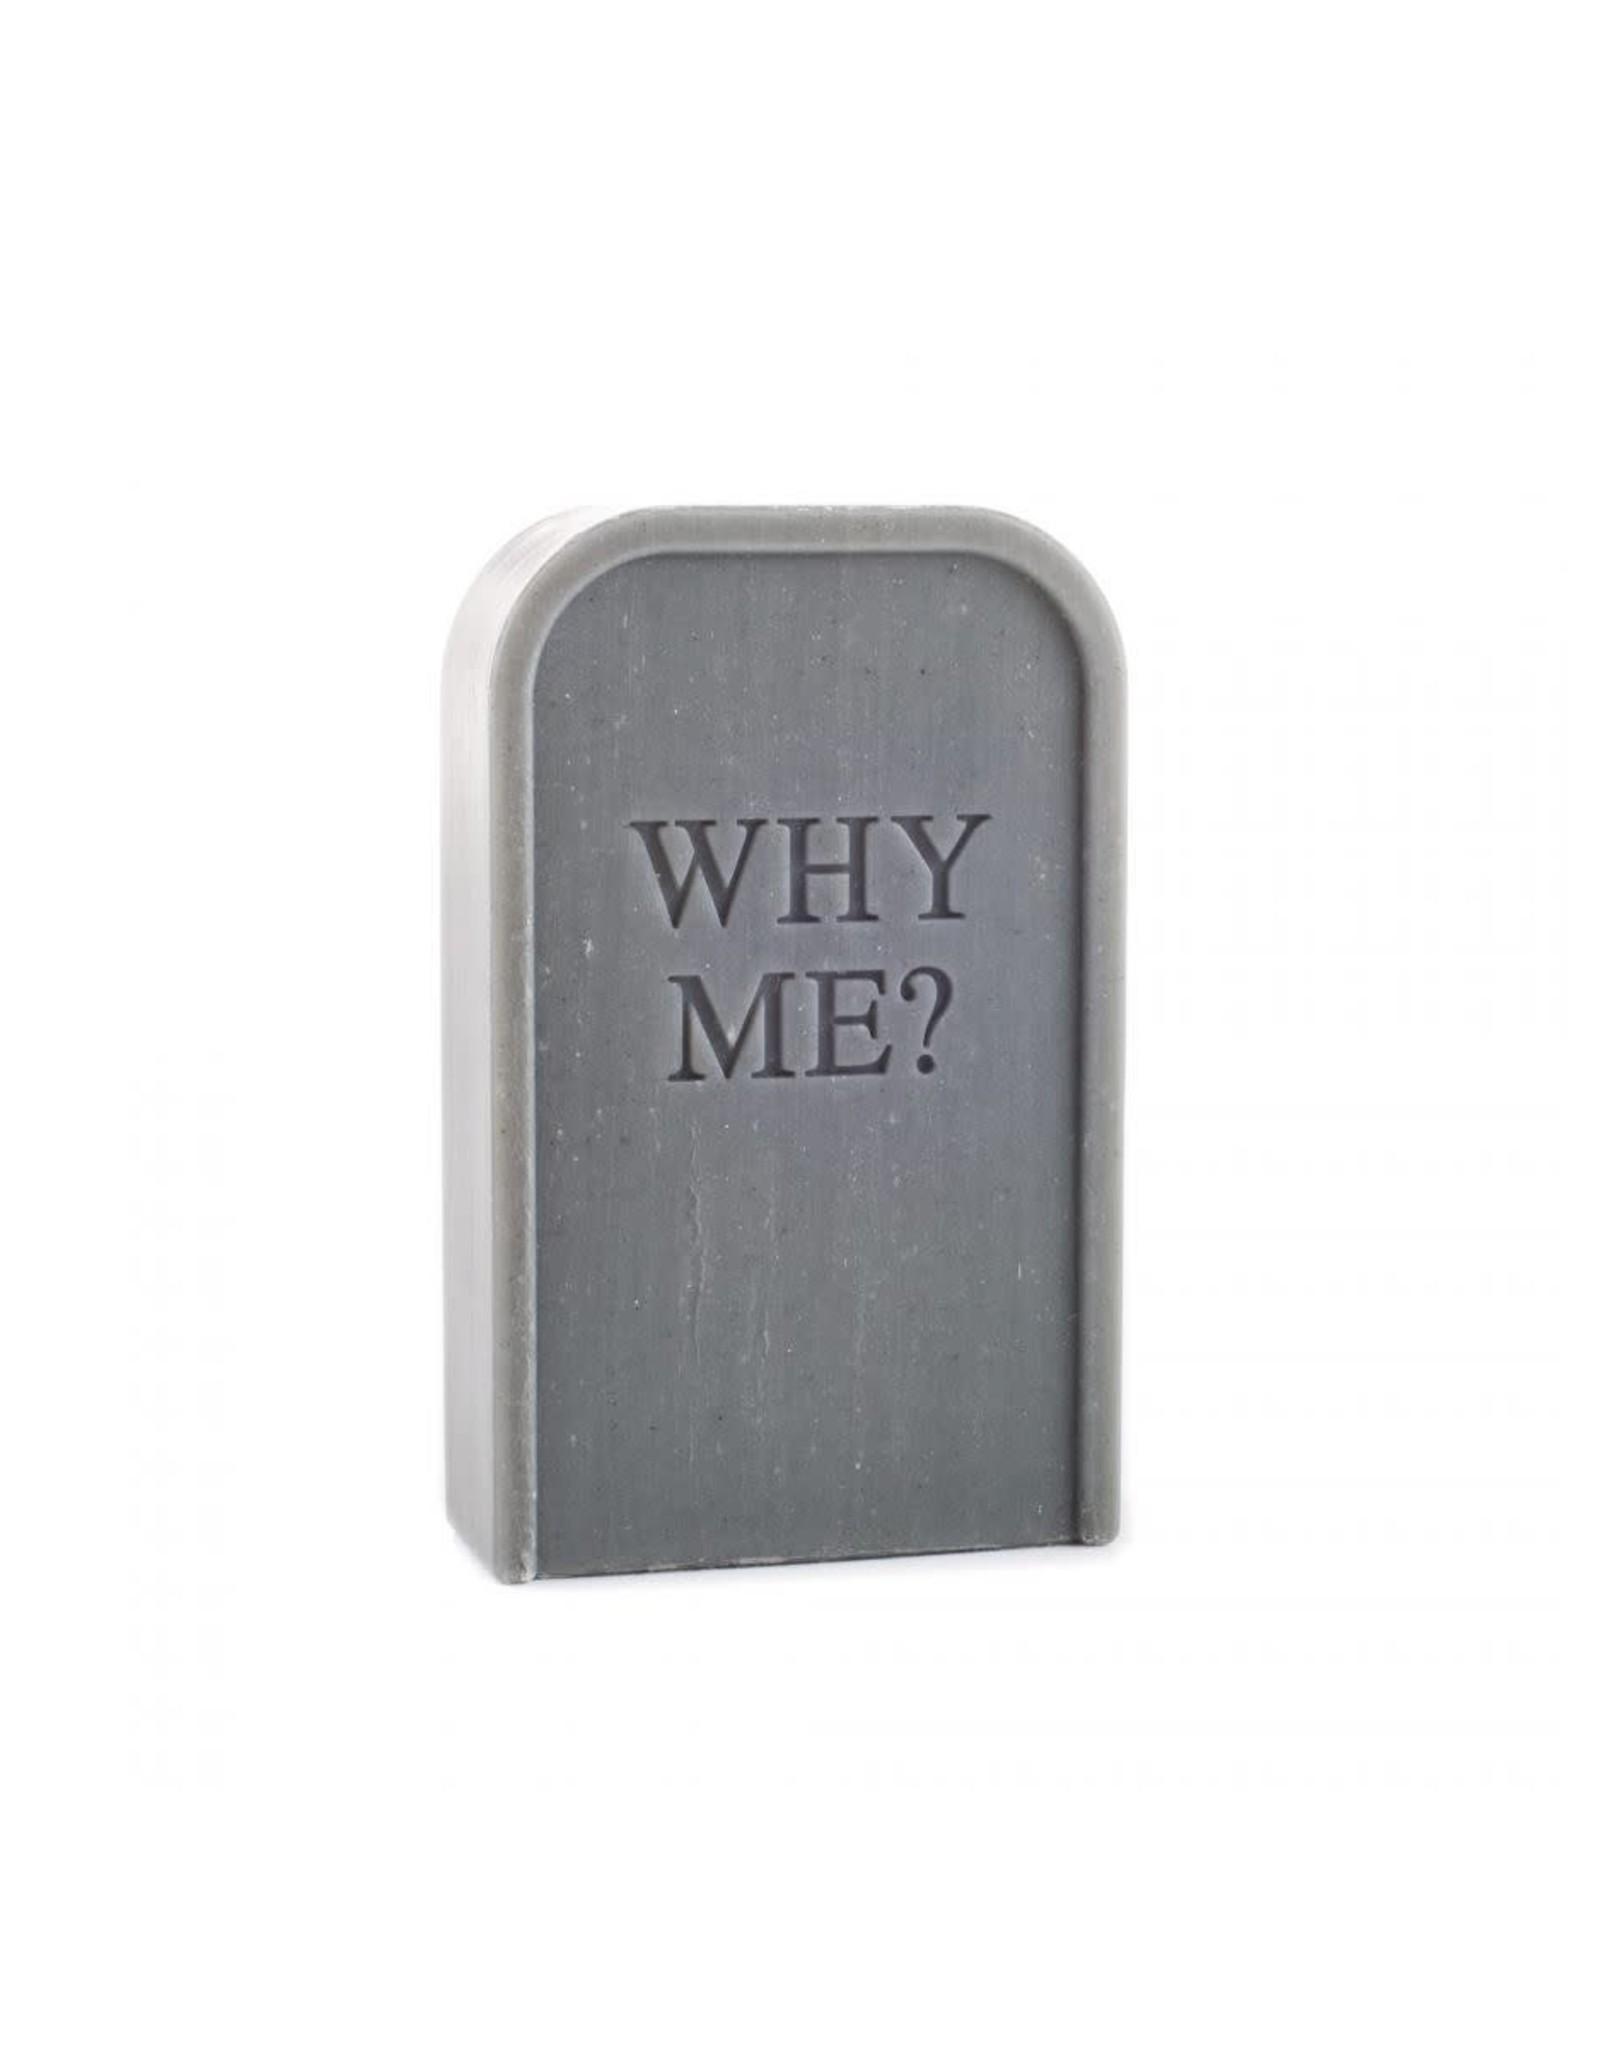 Seletti Soap Why Me?